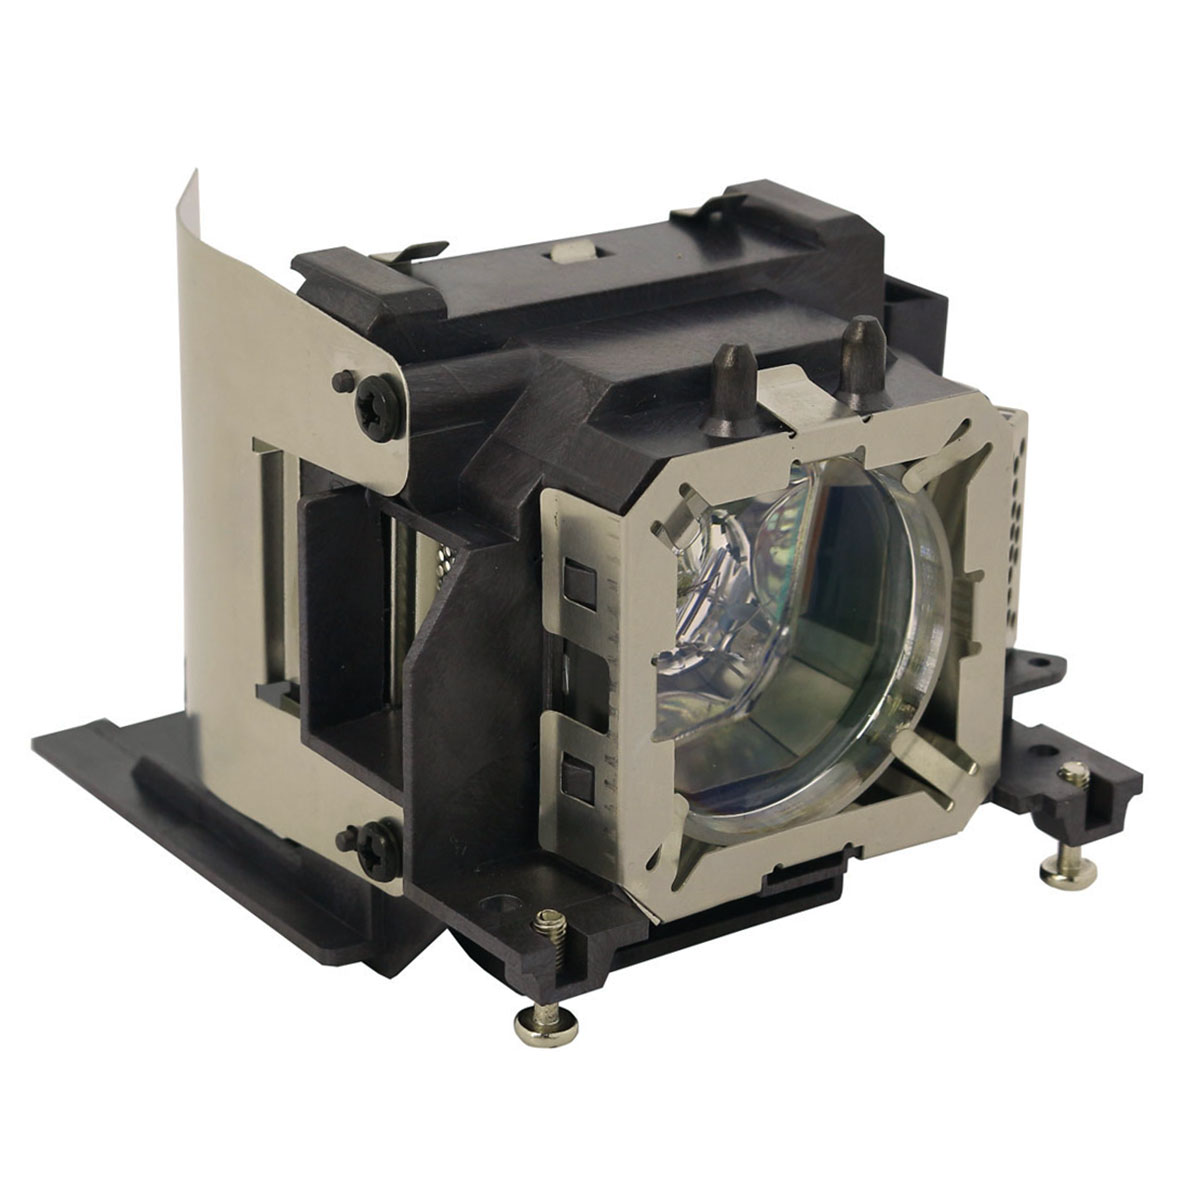 Projector Lamp Bulb ET-LAV300 for Panasonic PT-VW350 PT-VW340Z PT-VX415N PT-VX410Z PT-VX42Z PT-VW345NZ PT-W355N PT-VX420 PTVX425 original ush230w bulb inside projector lamp et lav300 for panasonic pt vw345nz nu pt vw340z u pt vx415nz pt vx410z u pt vx42z